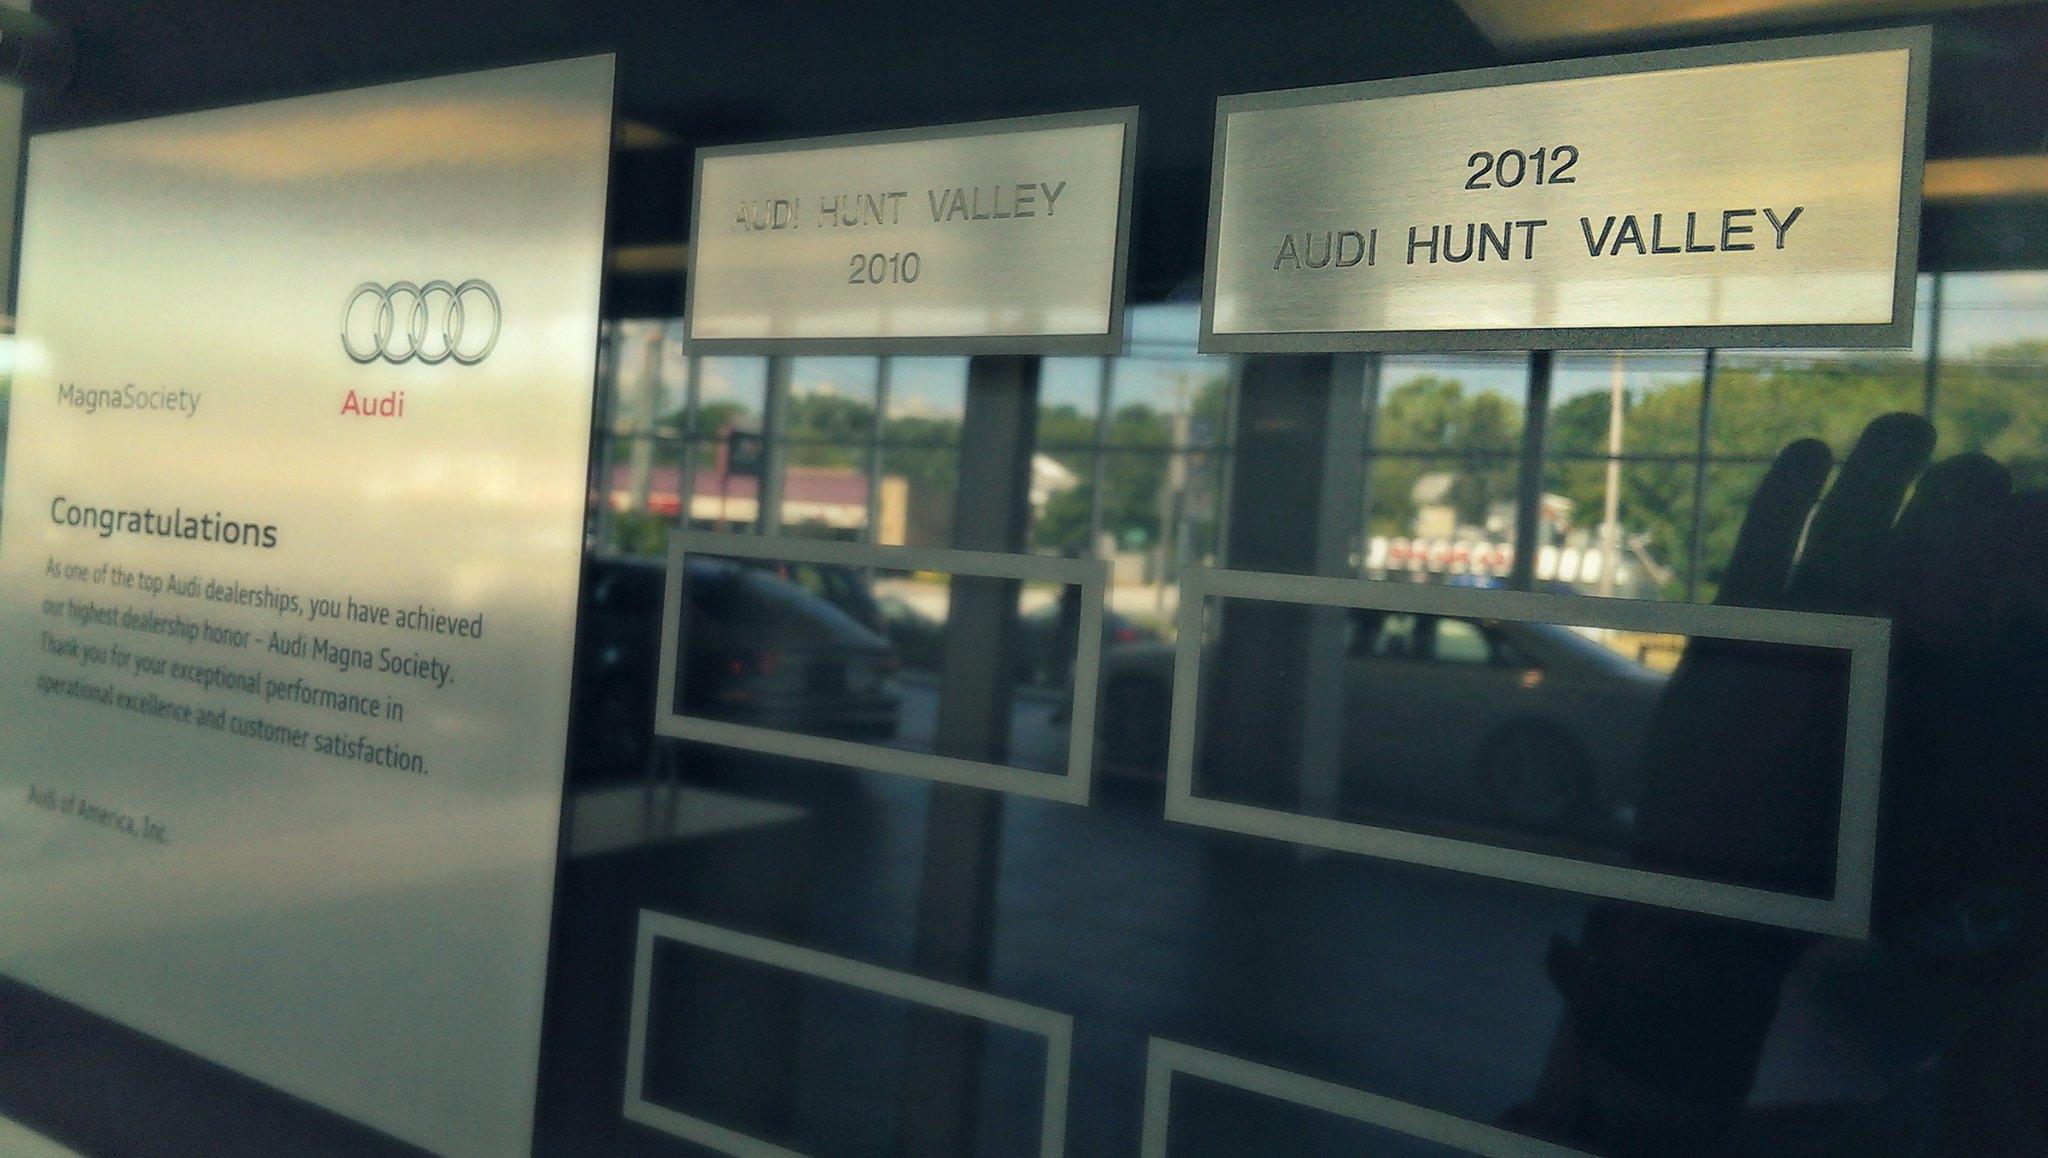 Audi Hunt Valley Flickr - Audi hunt valley